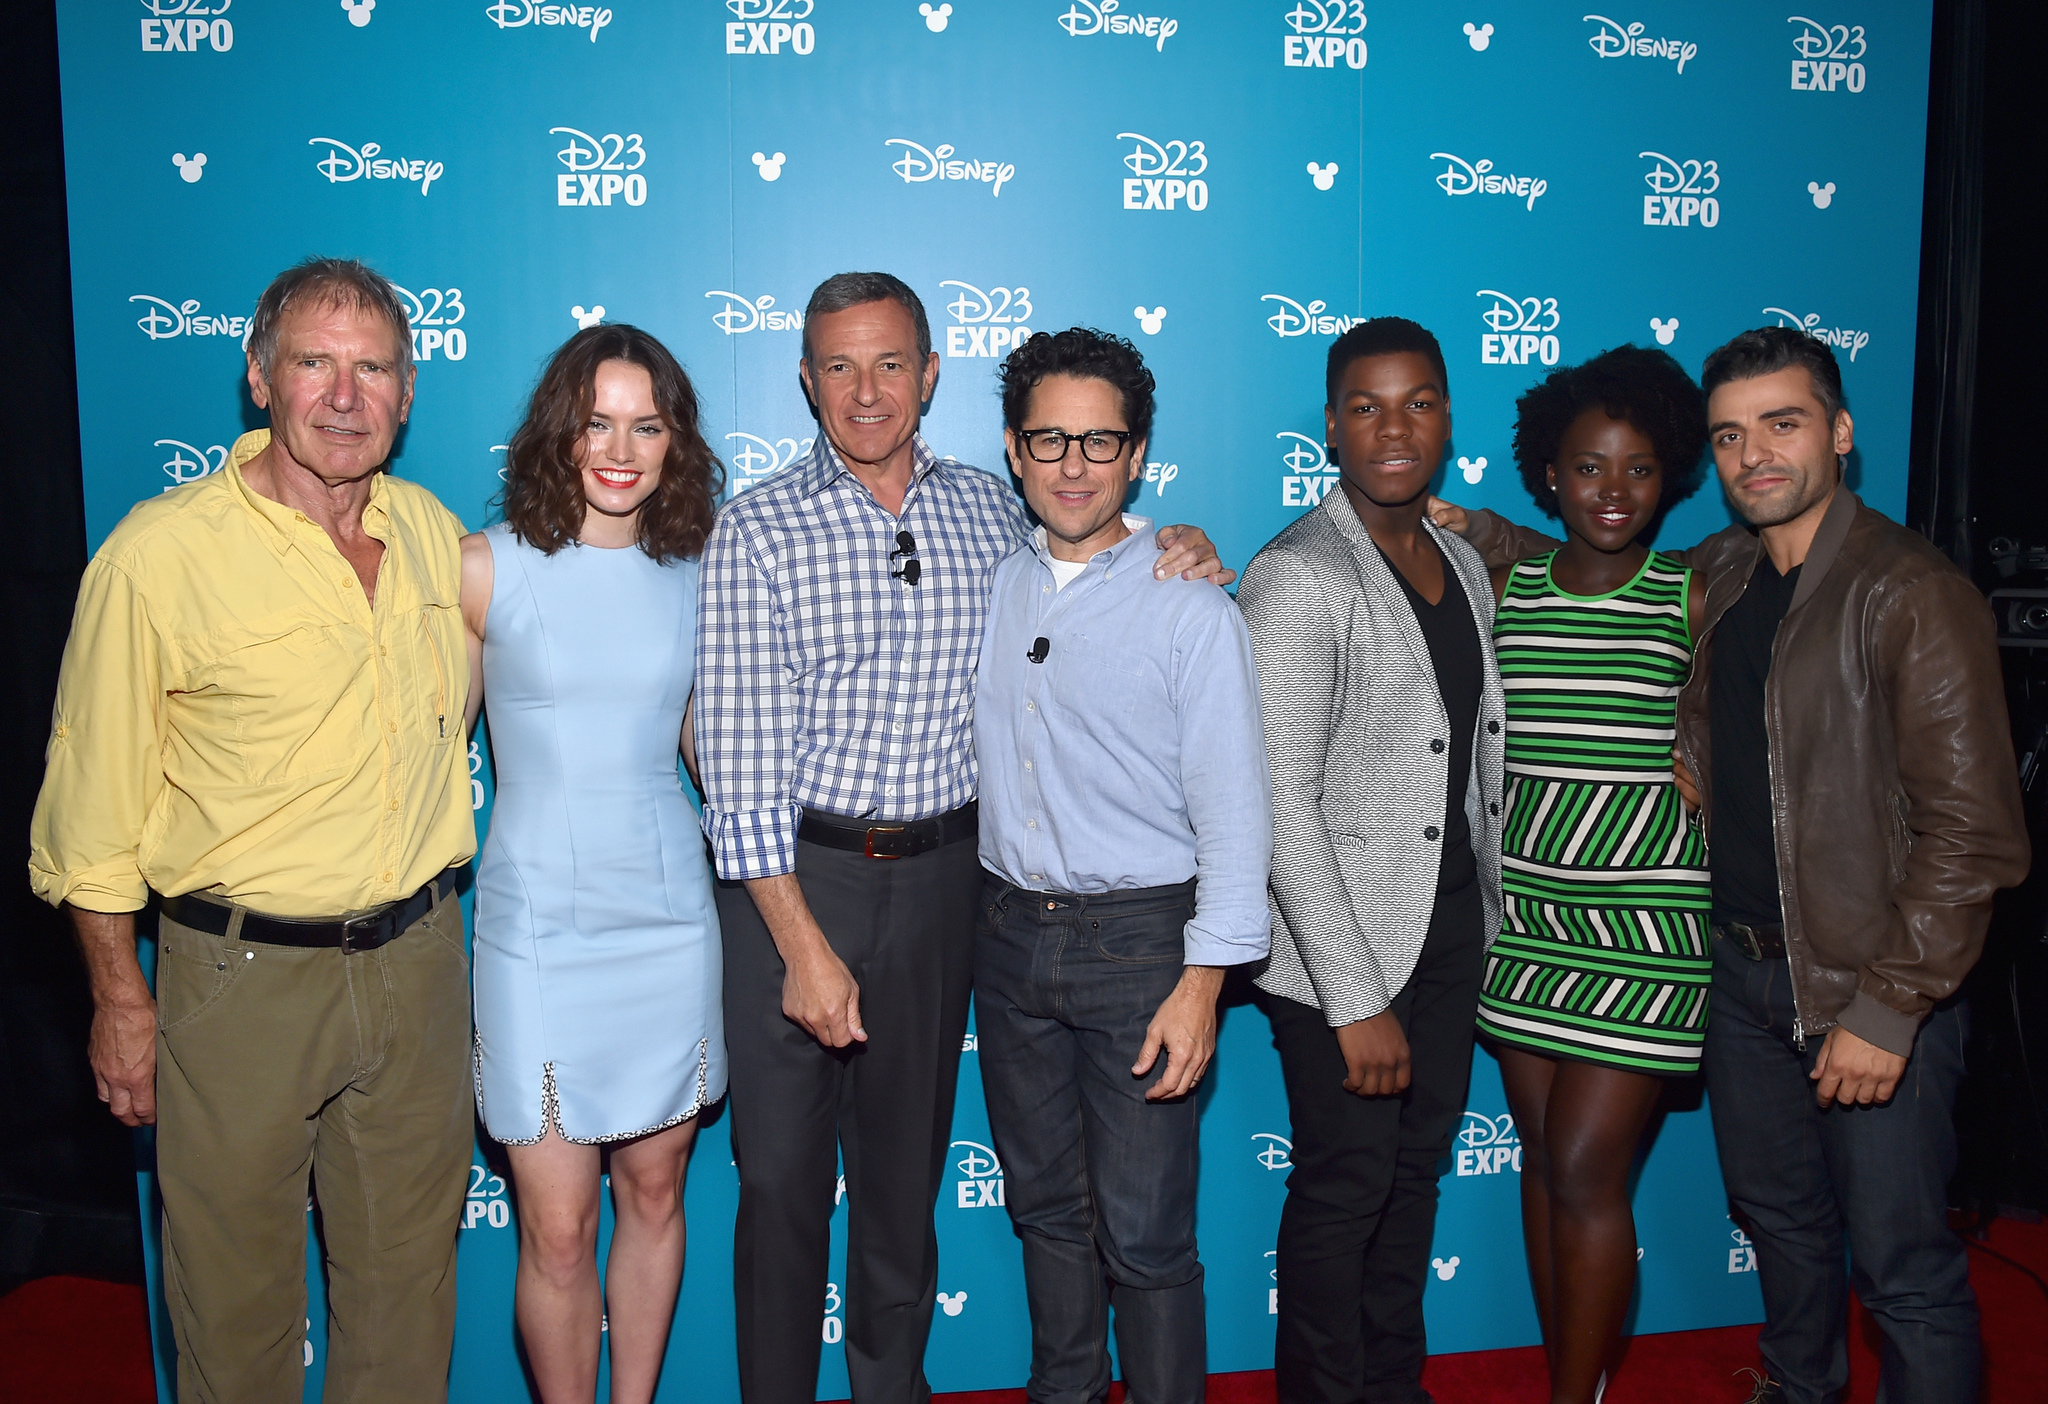 Harrison Ford, J.J. Abrams, Oscar Isaac, Lupita Nyong'o, John Boyega and Daisy Ridley